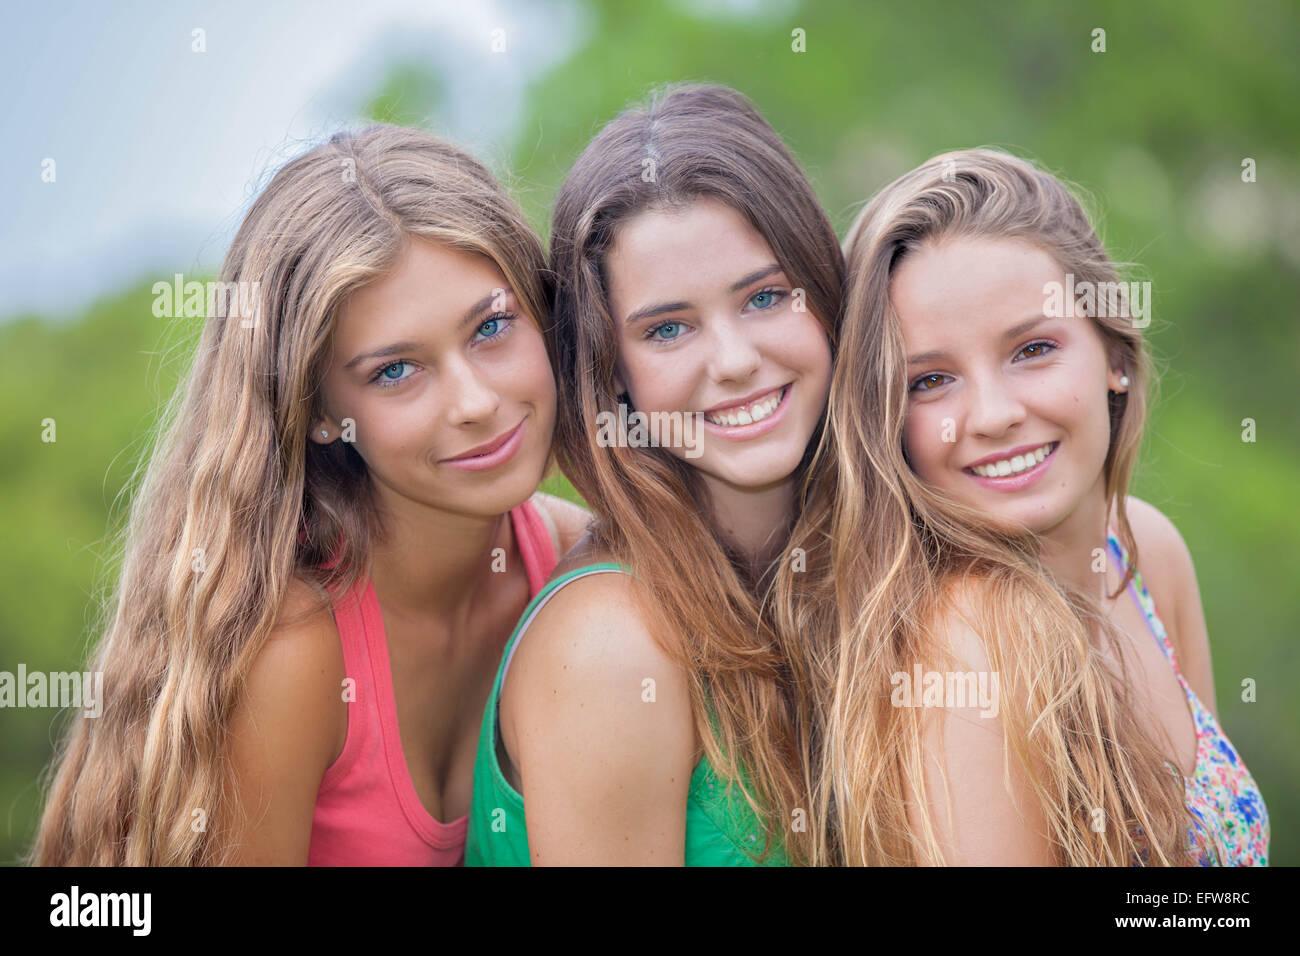 pics of teen girl